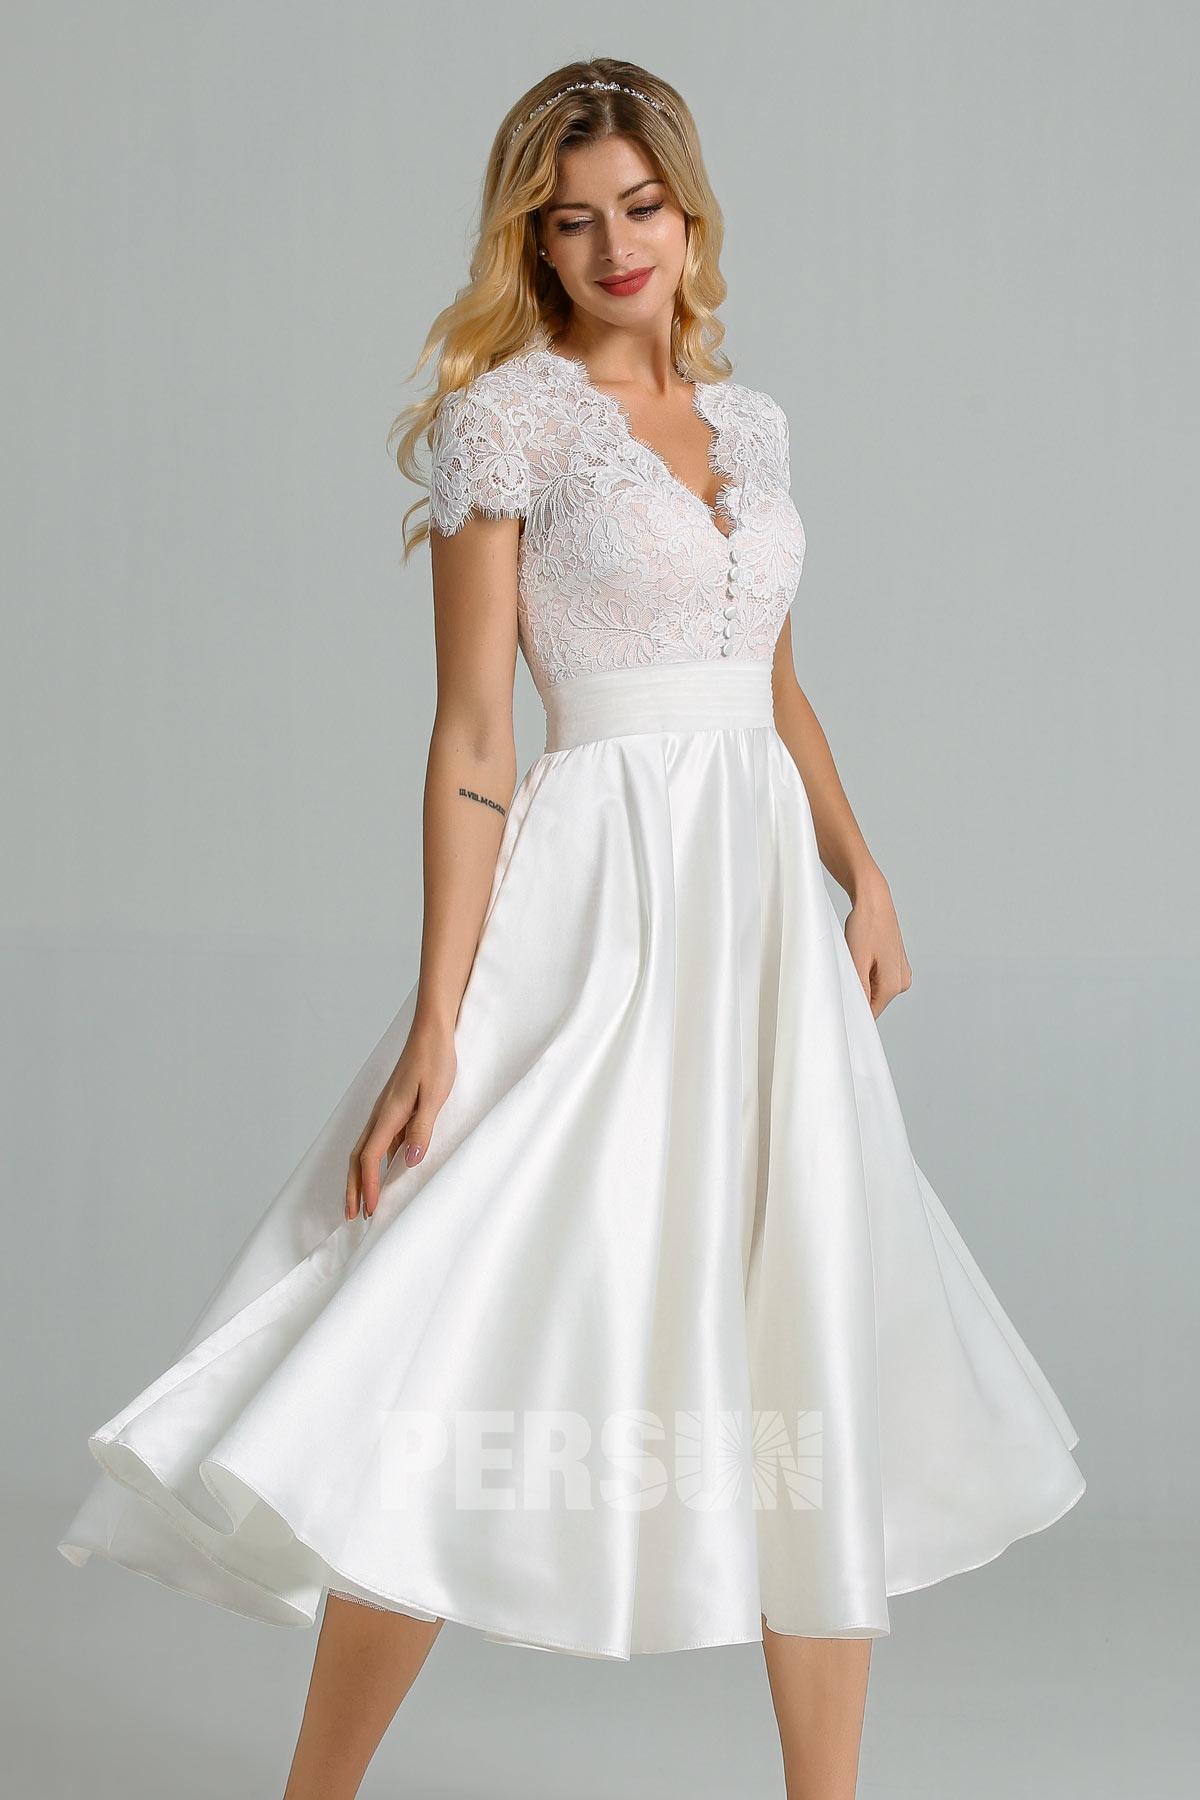 robe midi vintage mariée haut dentelle col v avec mancherons